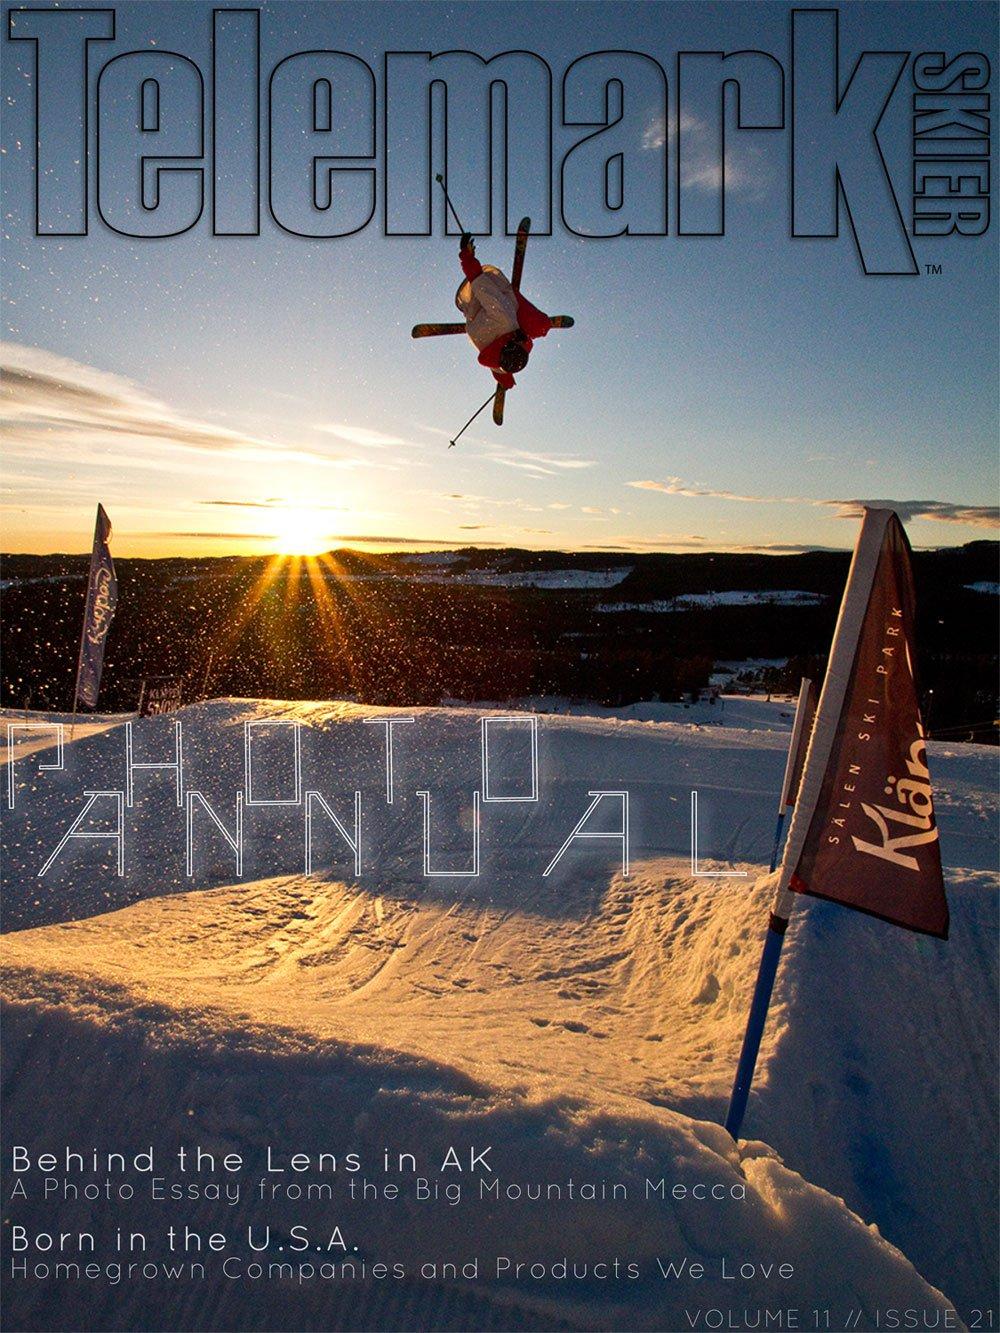 Andreas Sjöbeck - Telemark Skier Cover December